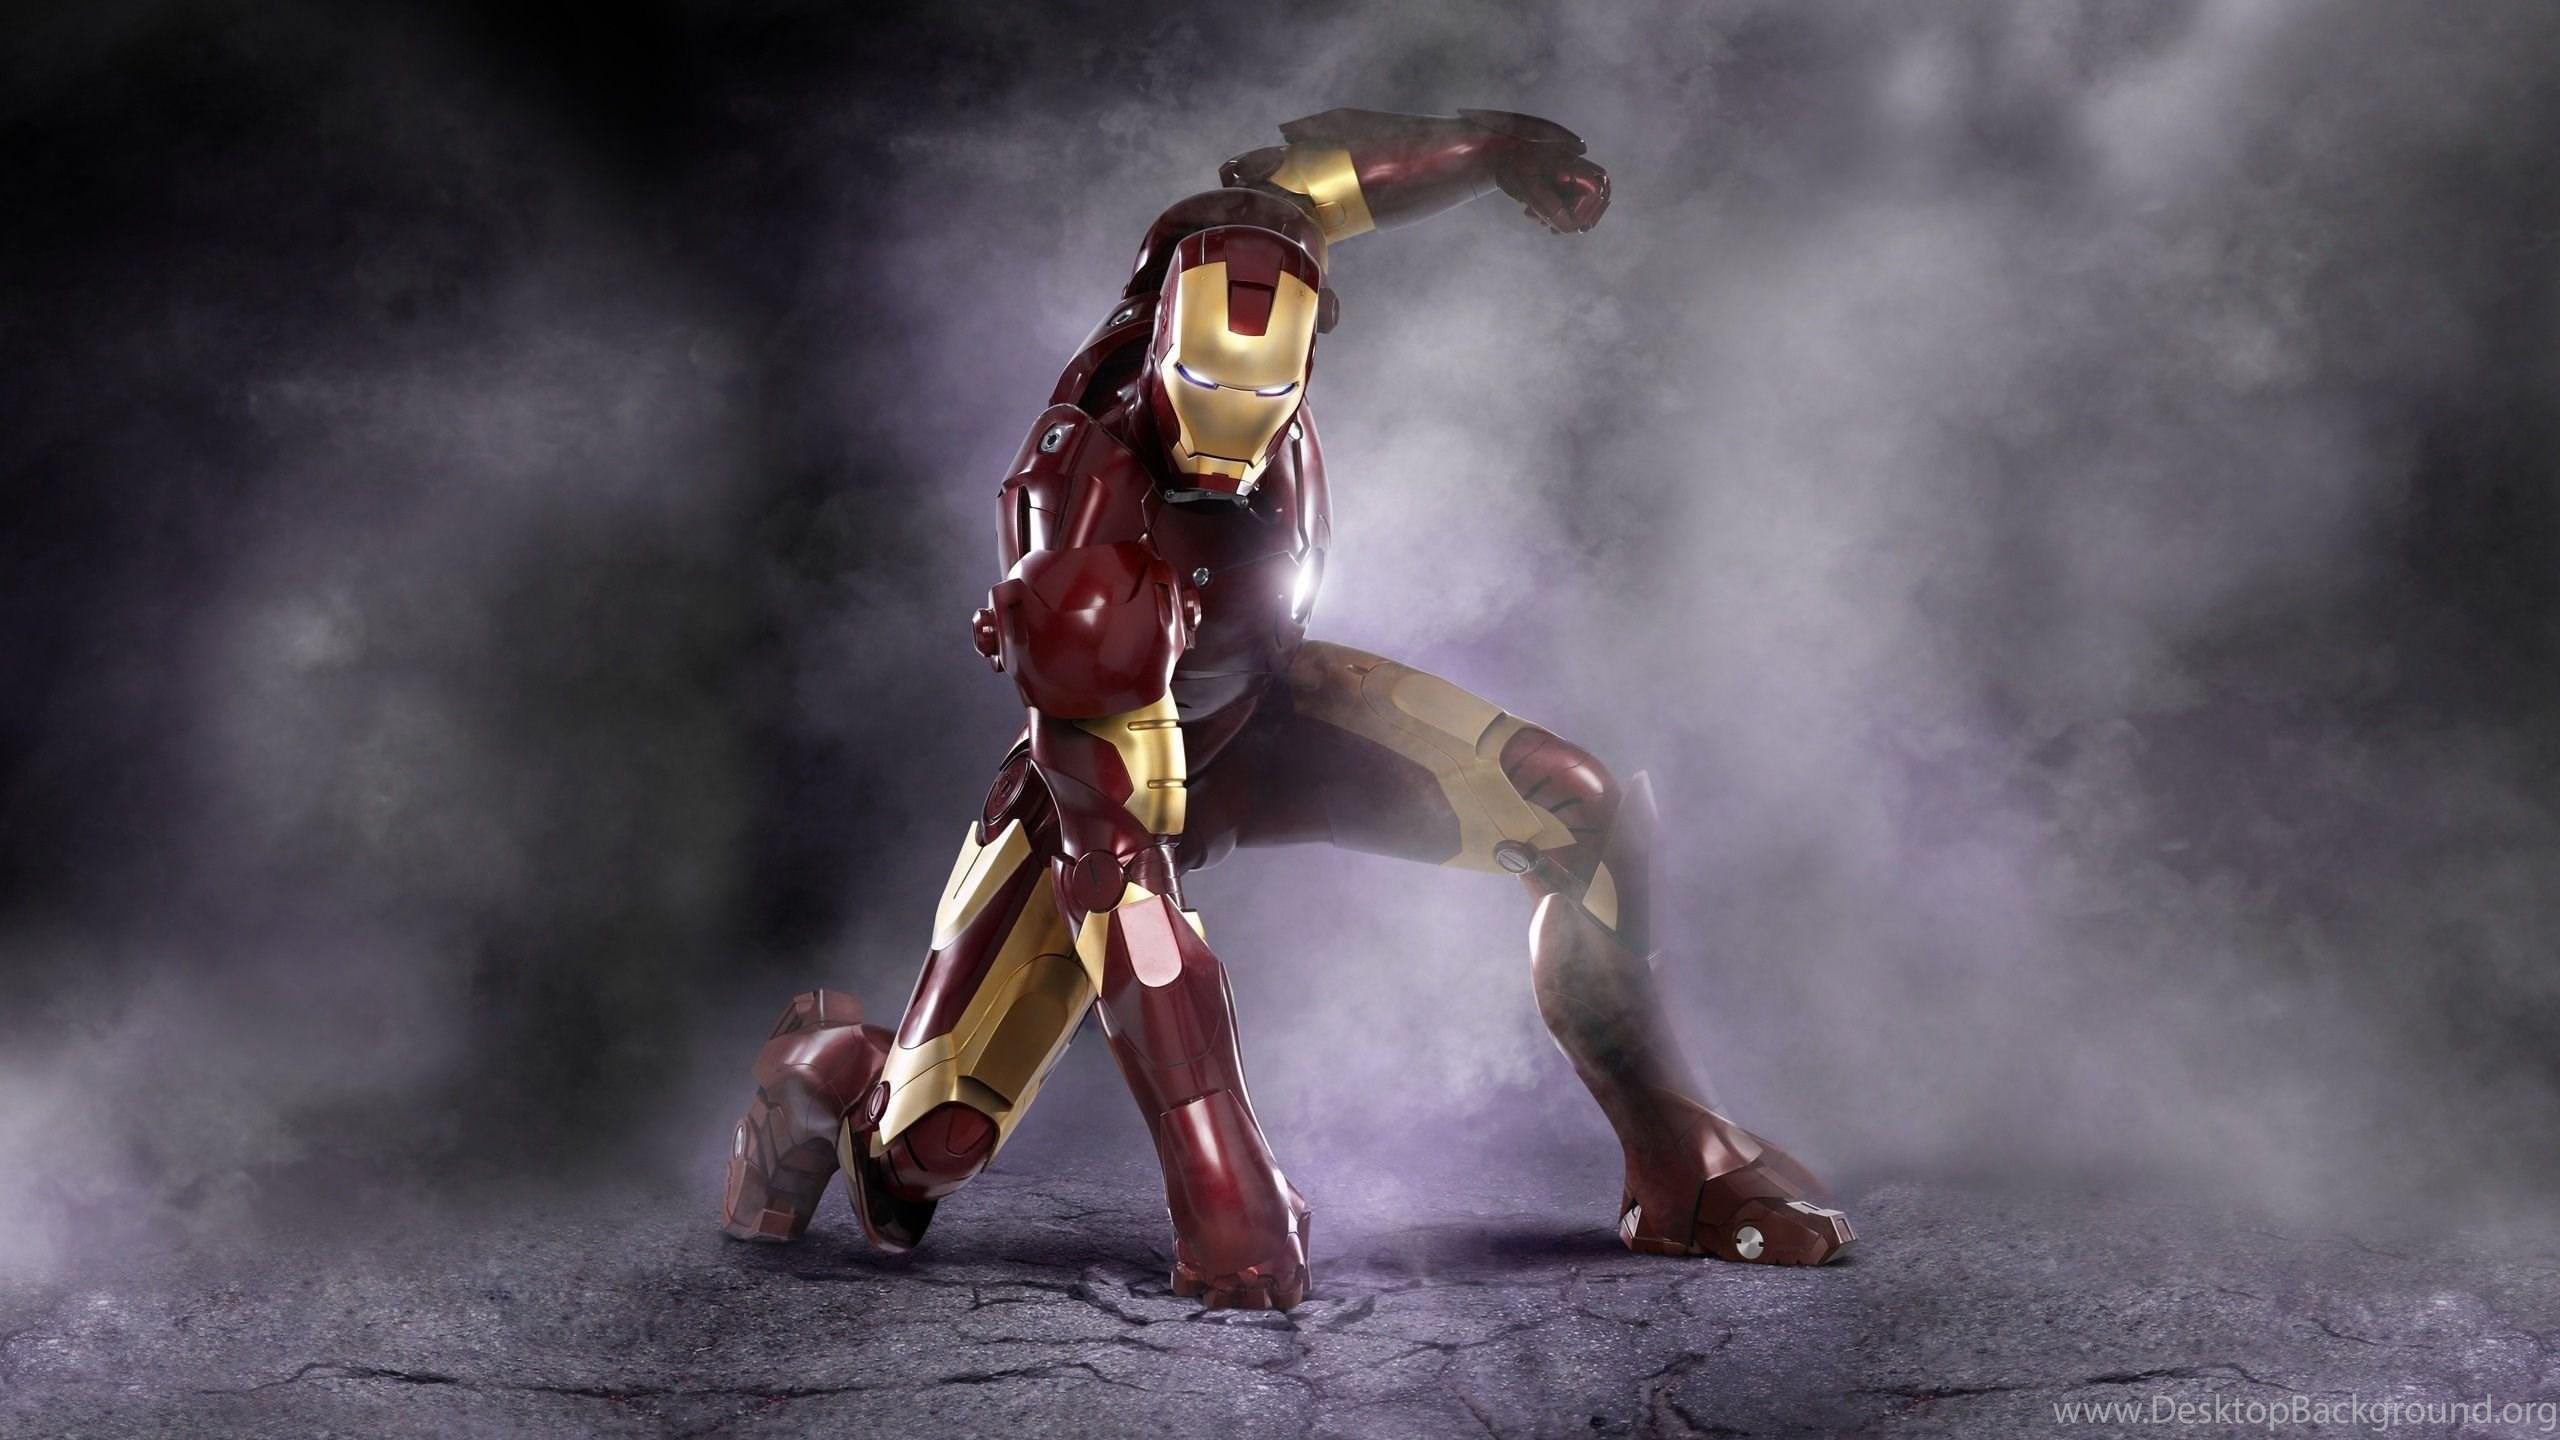 Iron Man Hd Wallpapers Desktop Background